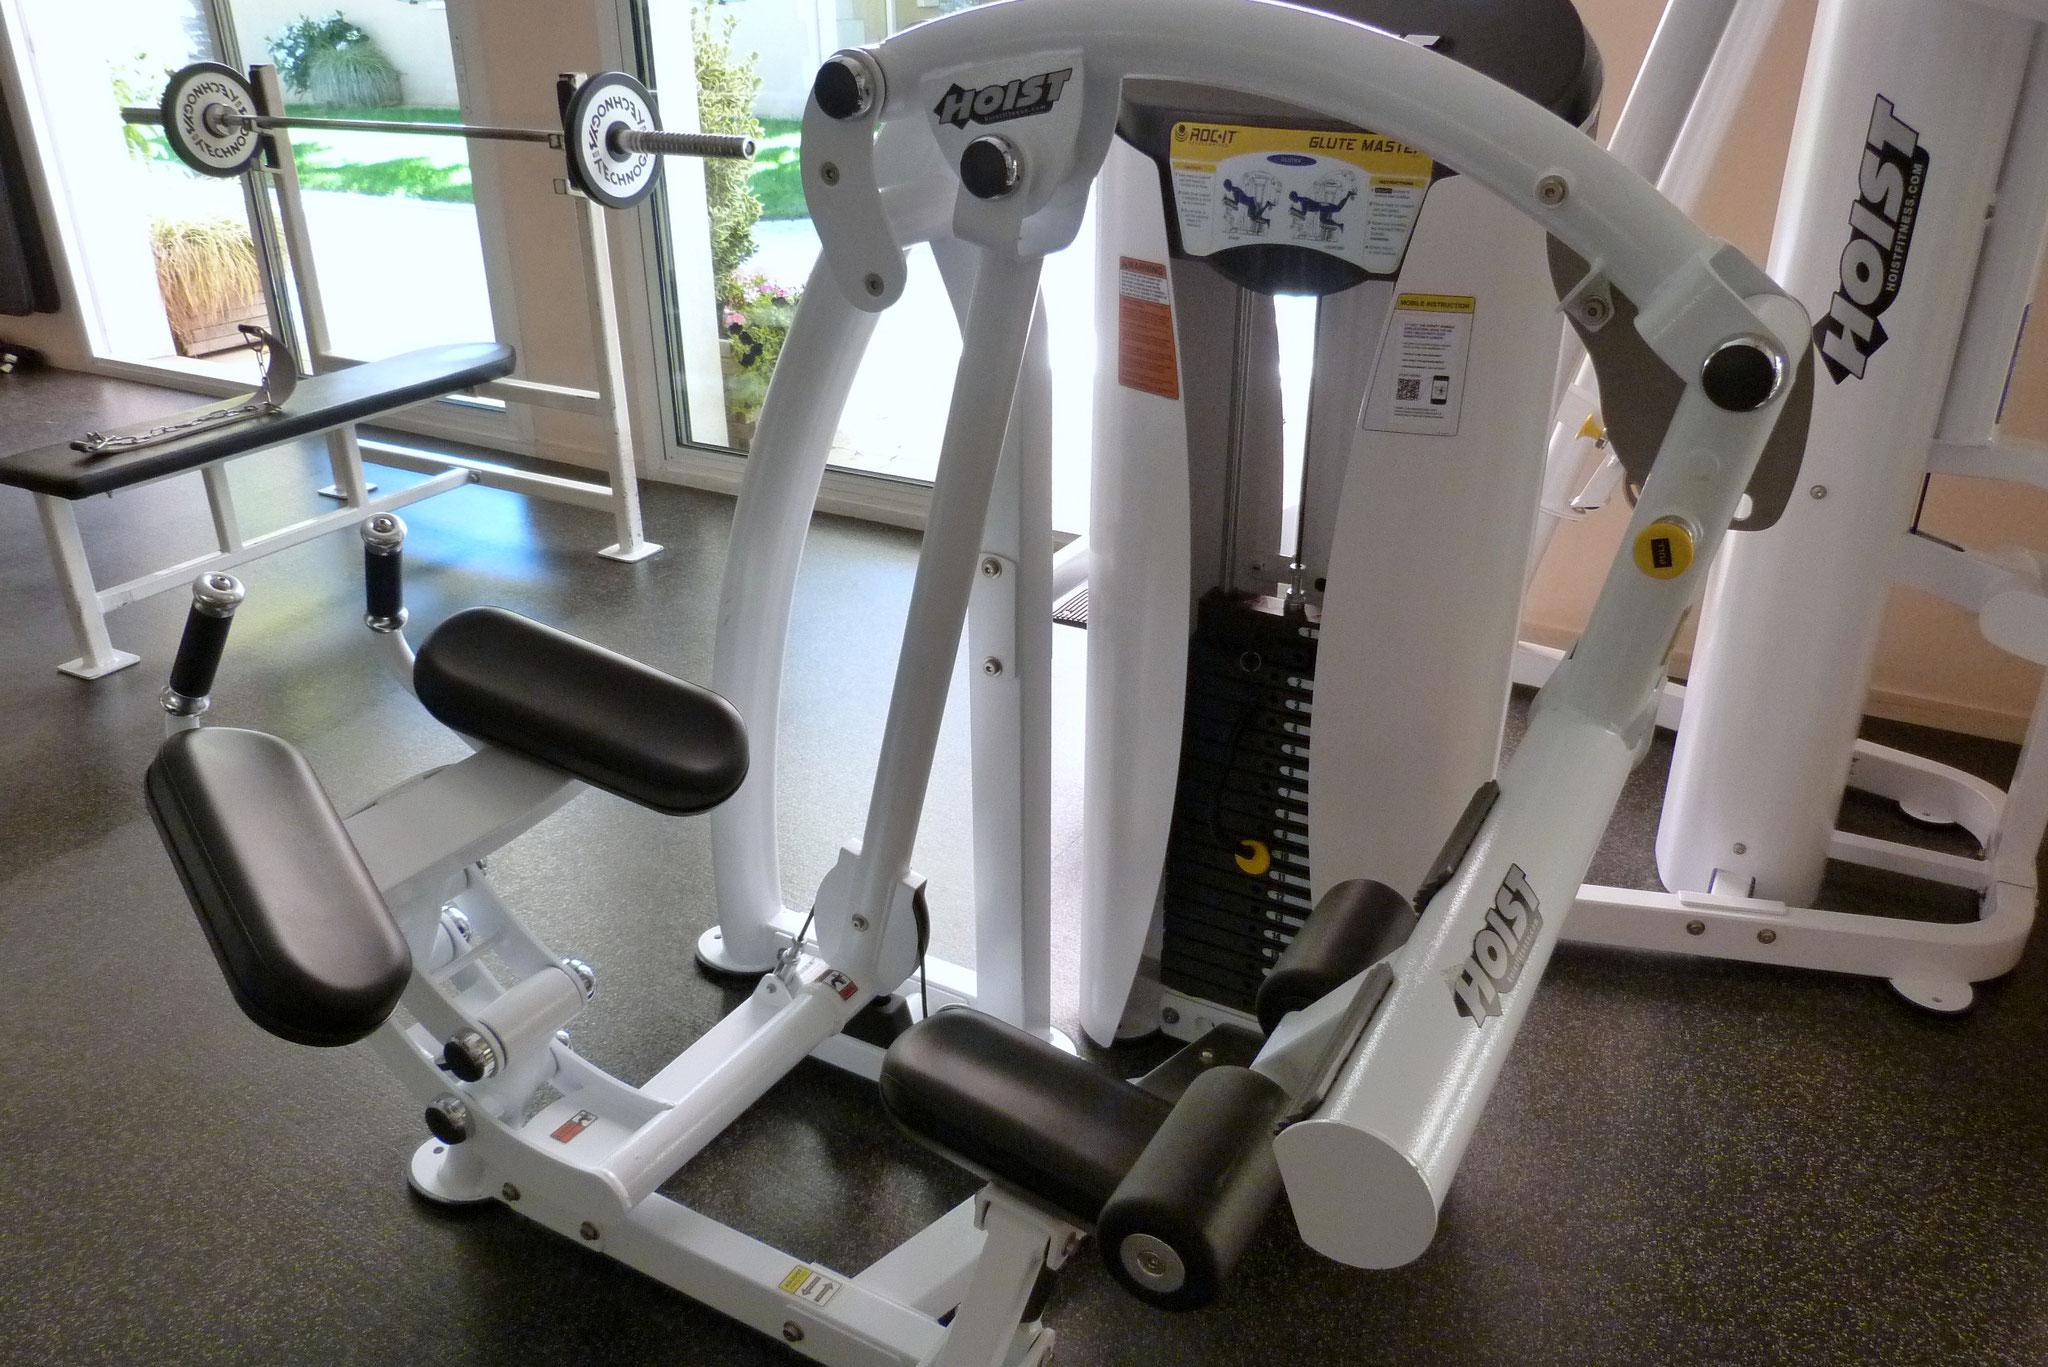 Centre Wellness Bergerac, des appareils à l'ergonomie parfaite